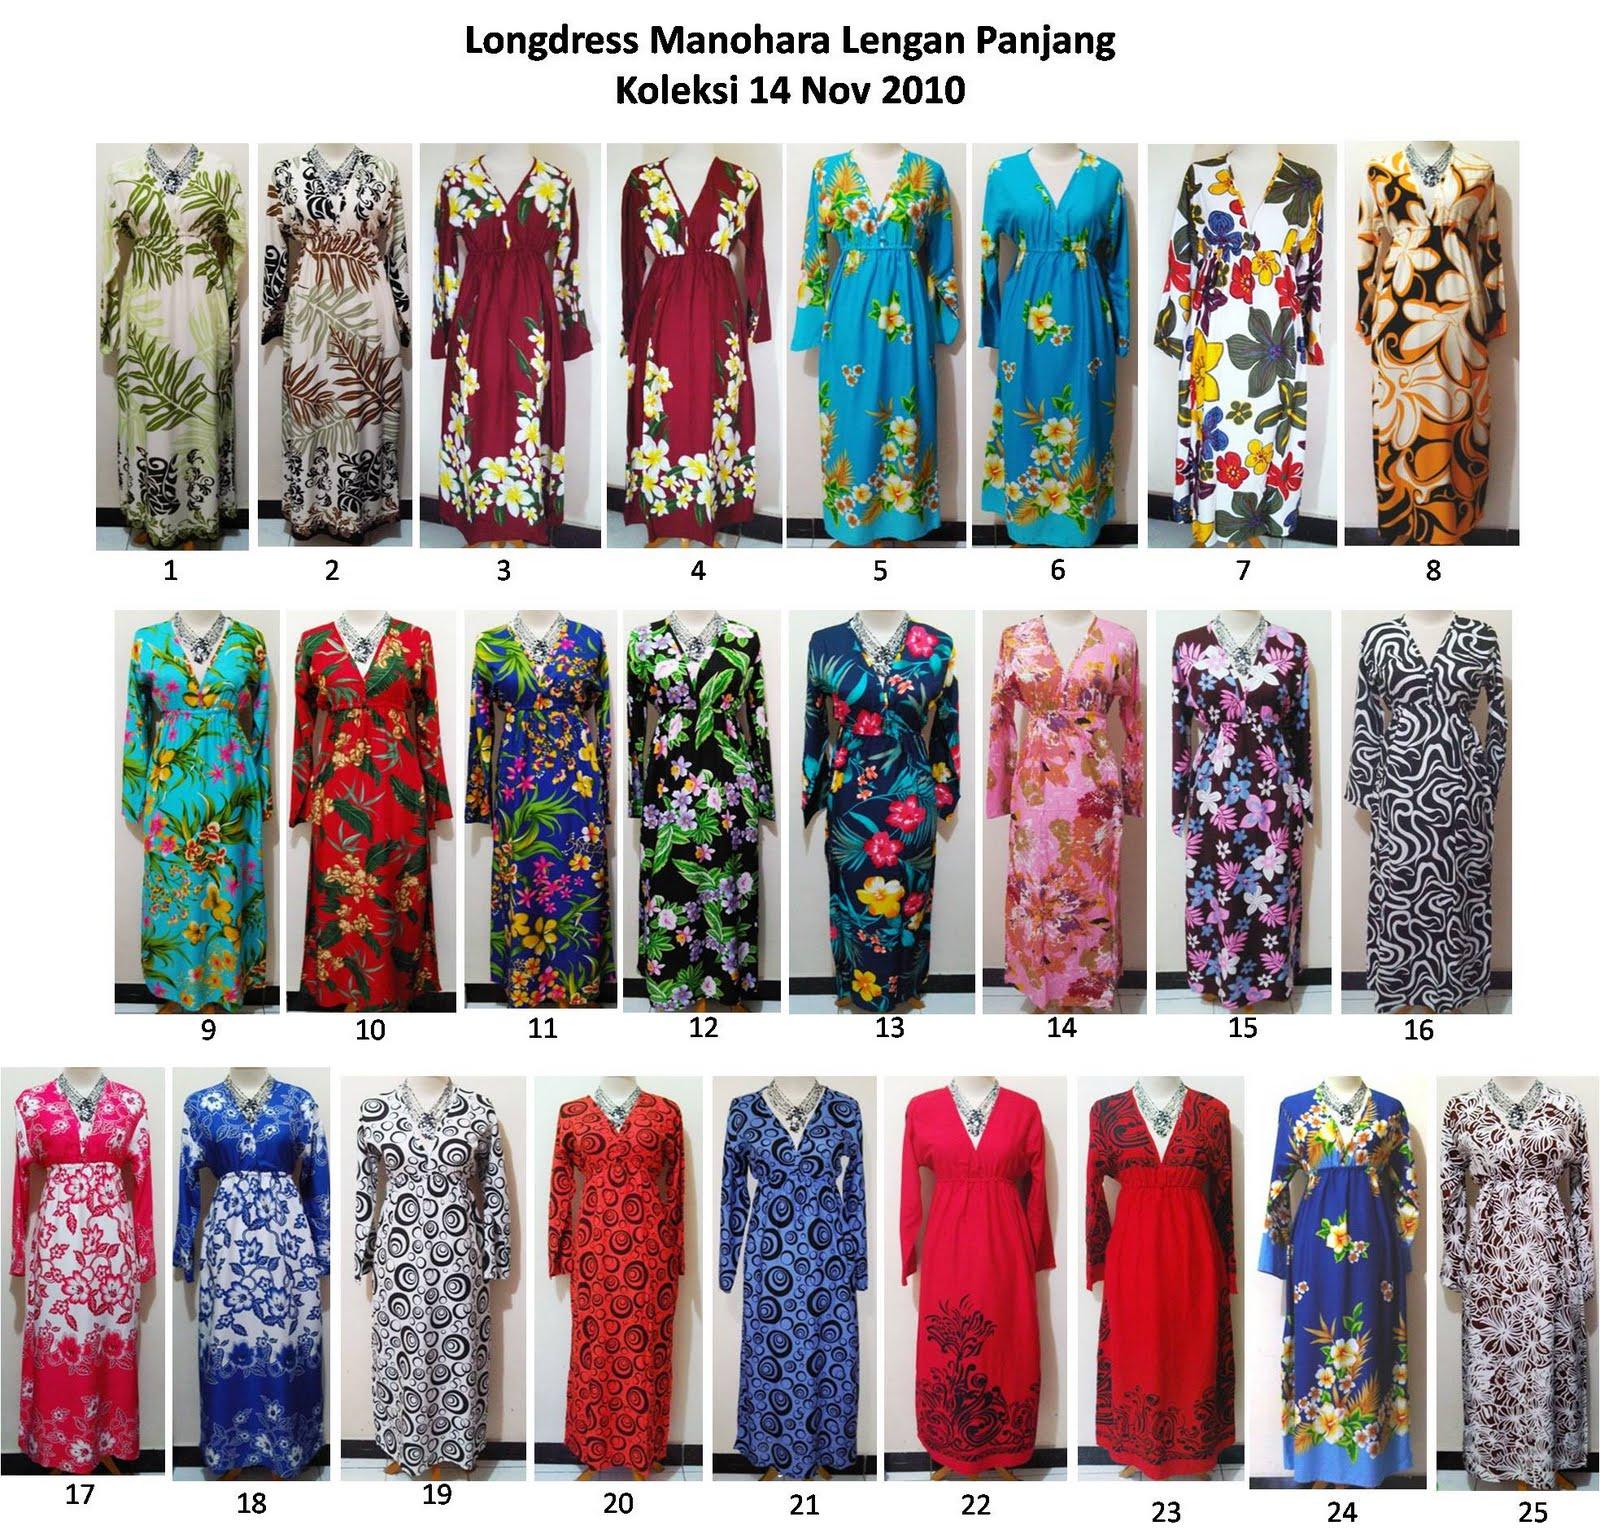 Baju Modern Long Dress Manohara Lengan Panjang Longdress Daster